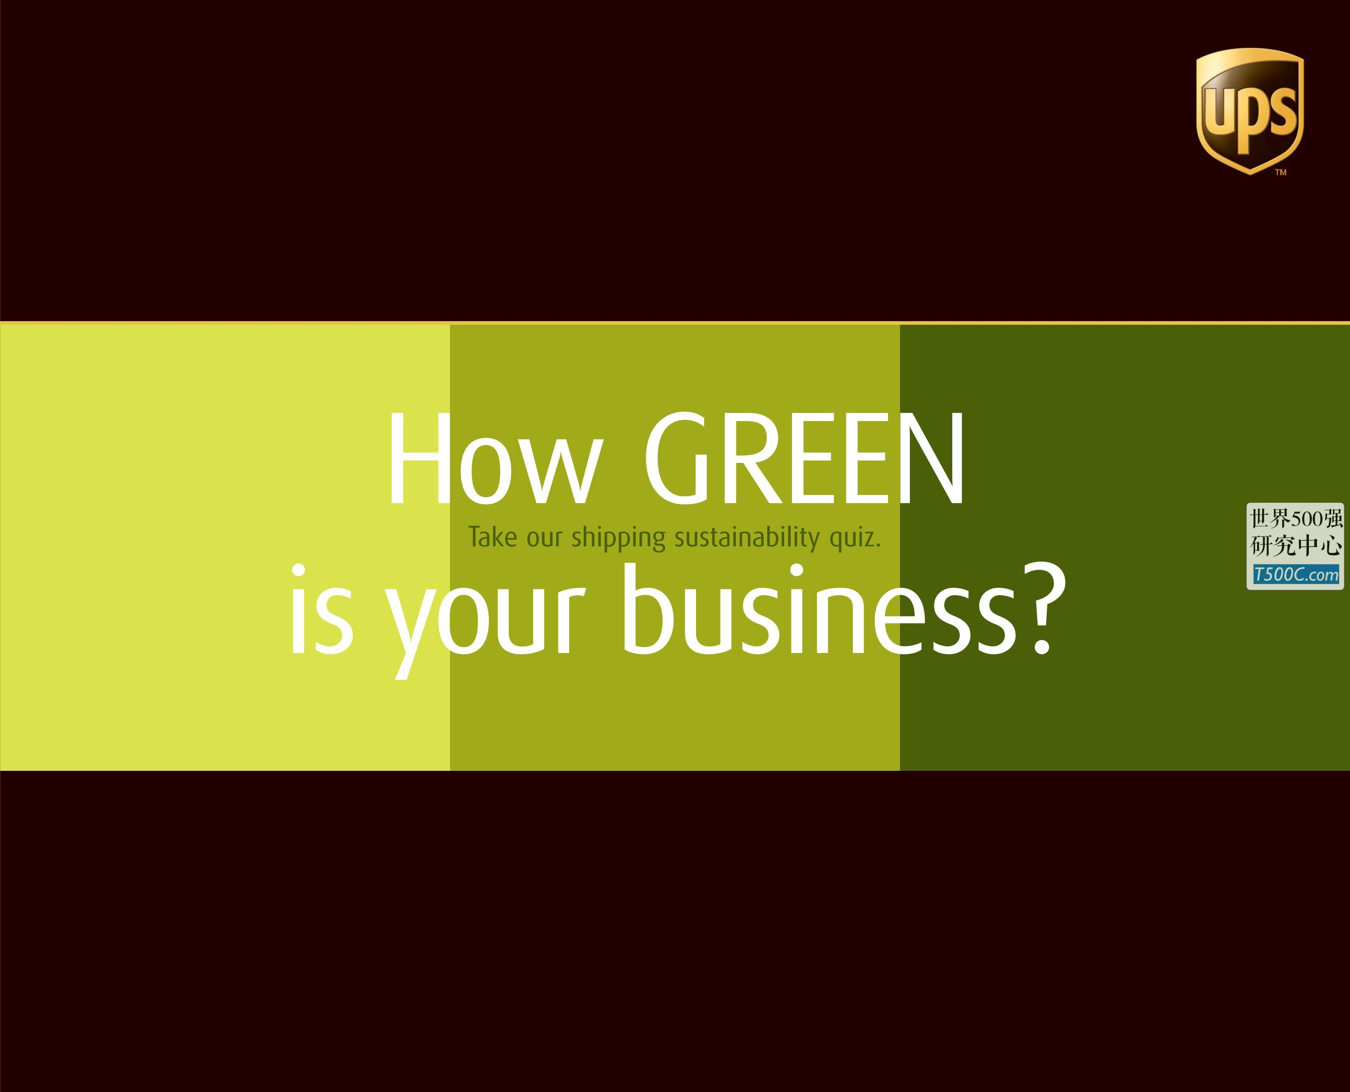 联合包裹服务UPS_见解宣传册Brochure_T500C.com_Decision Green Brochure.pdf